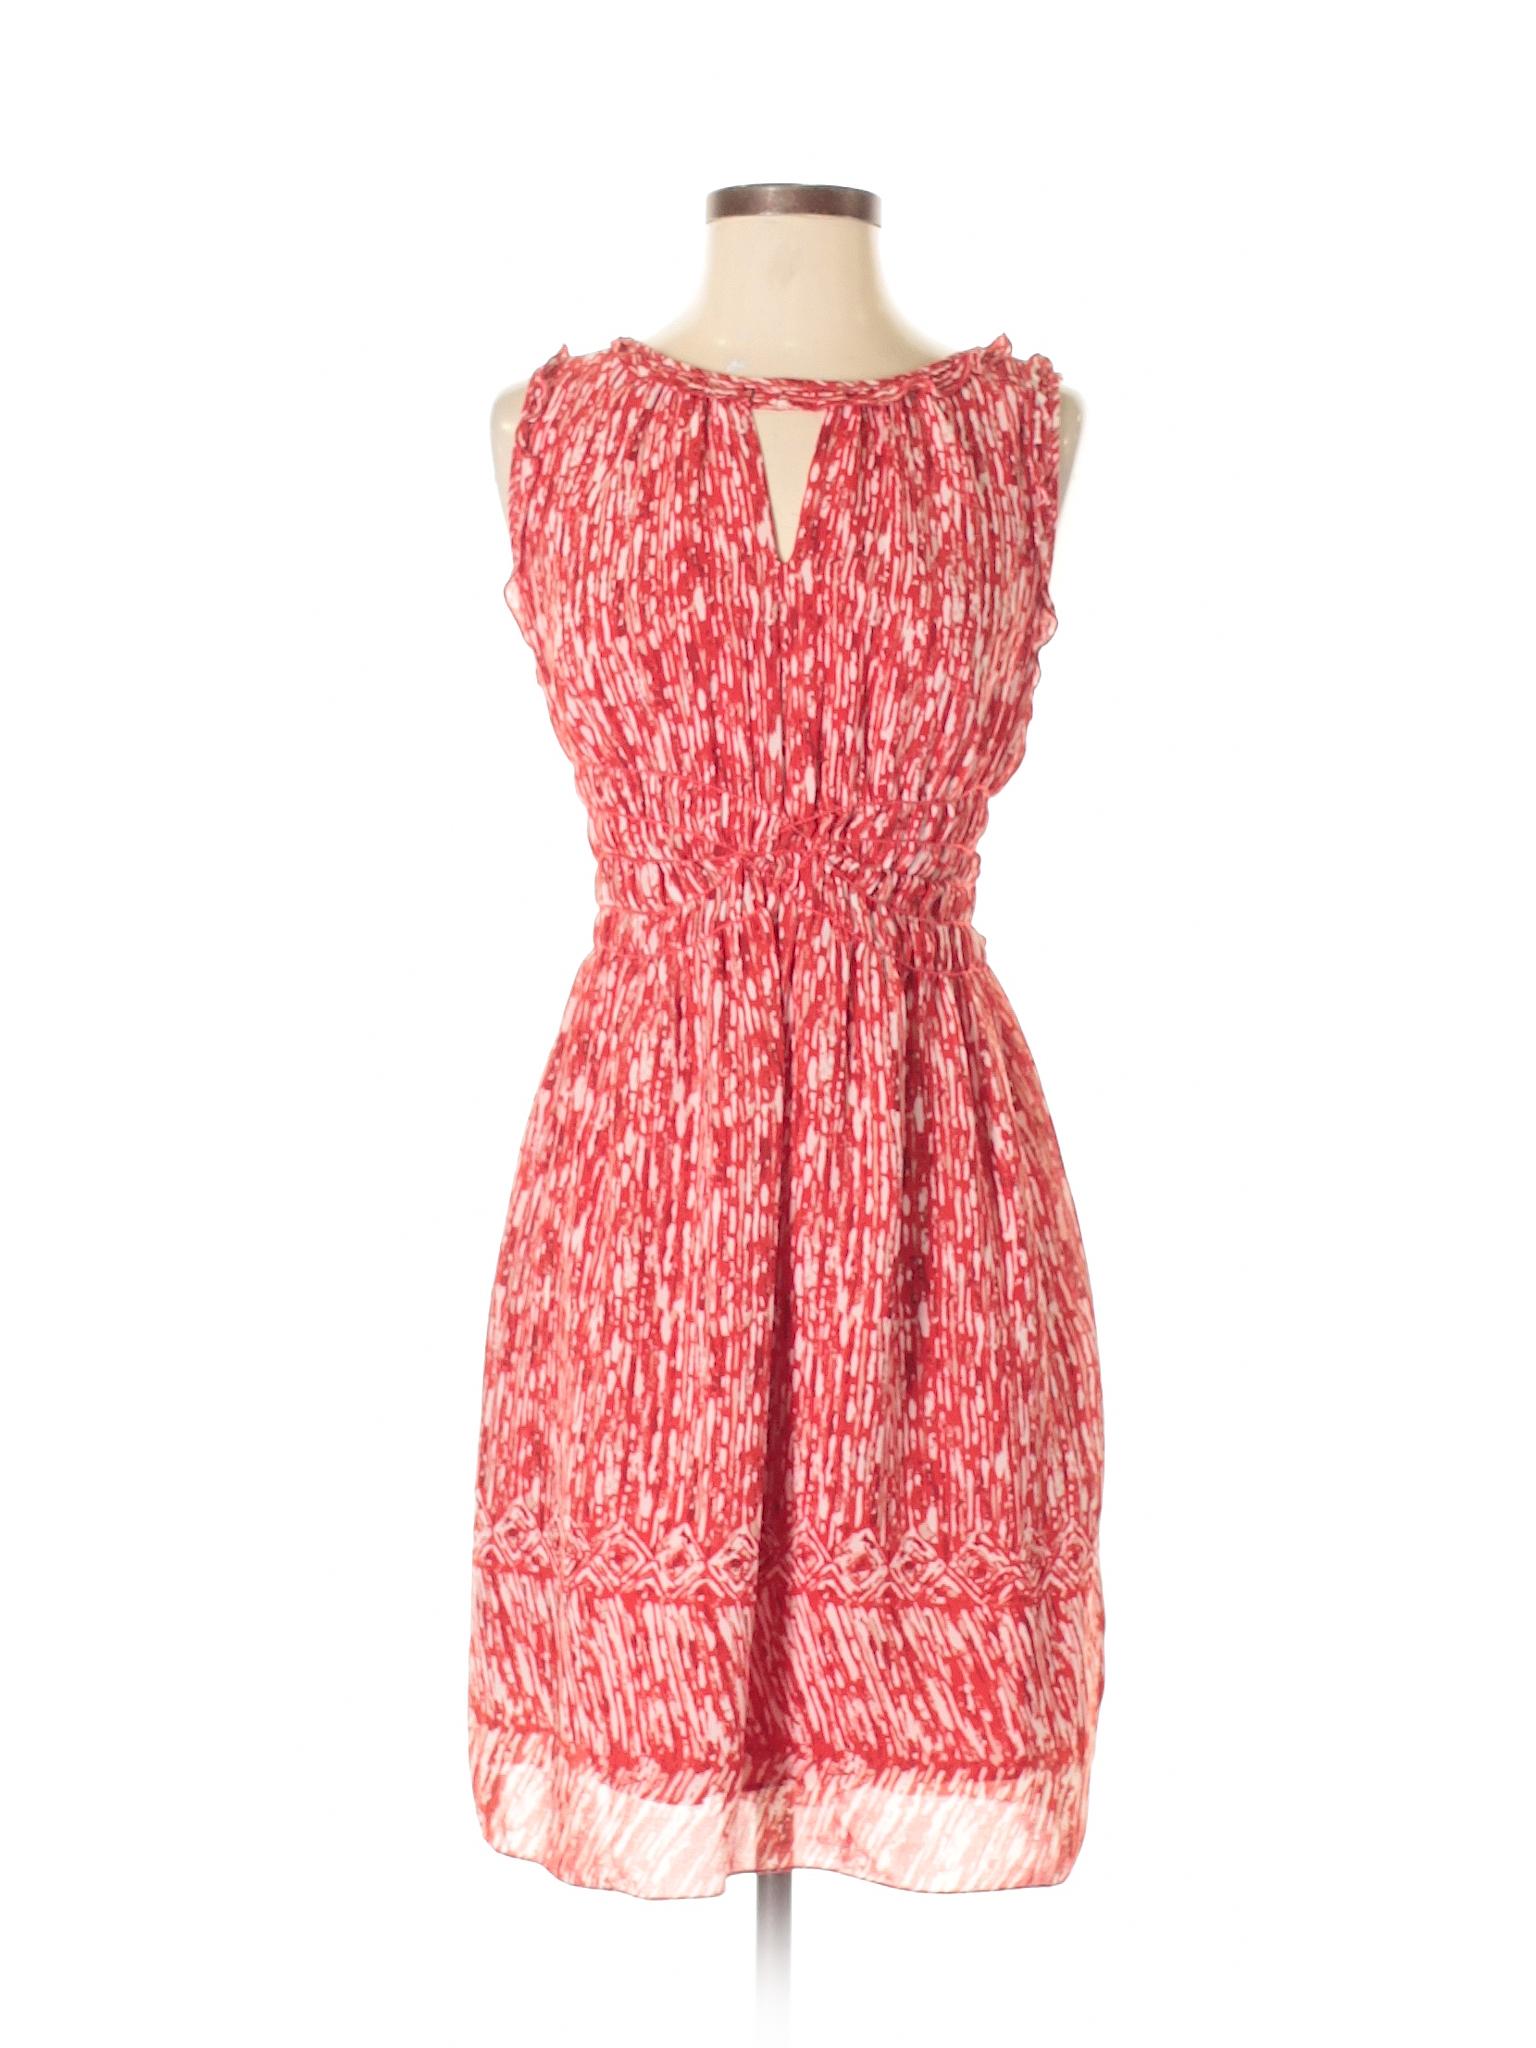 Studio Dress Selling Max Casual Selling Max 4pWnPnqF